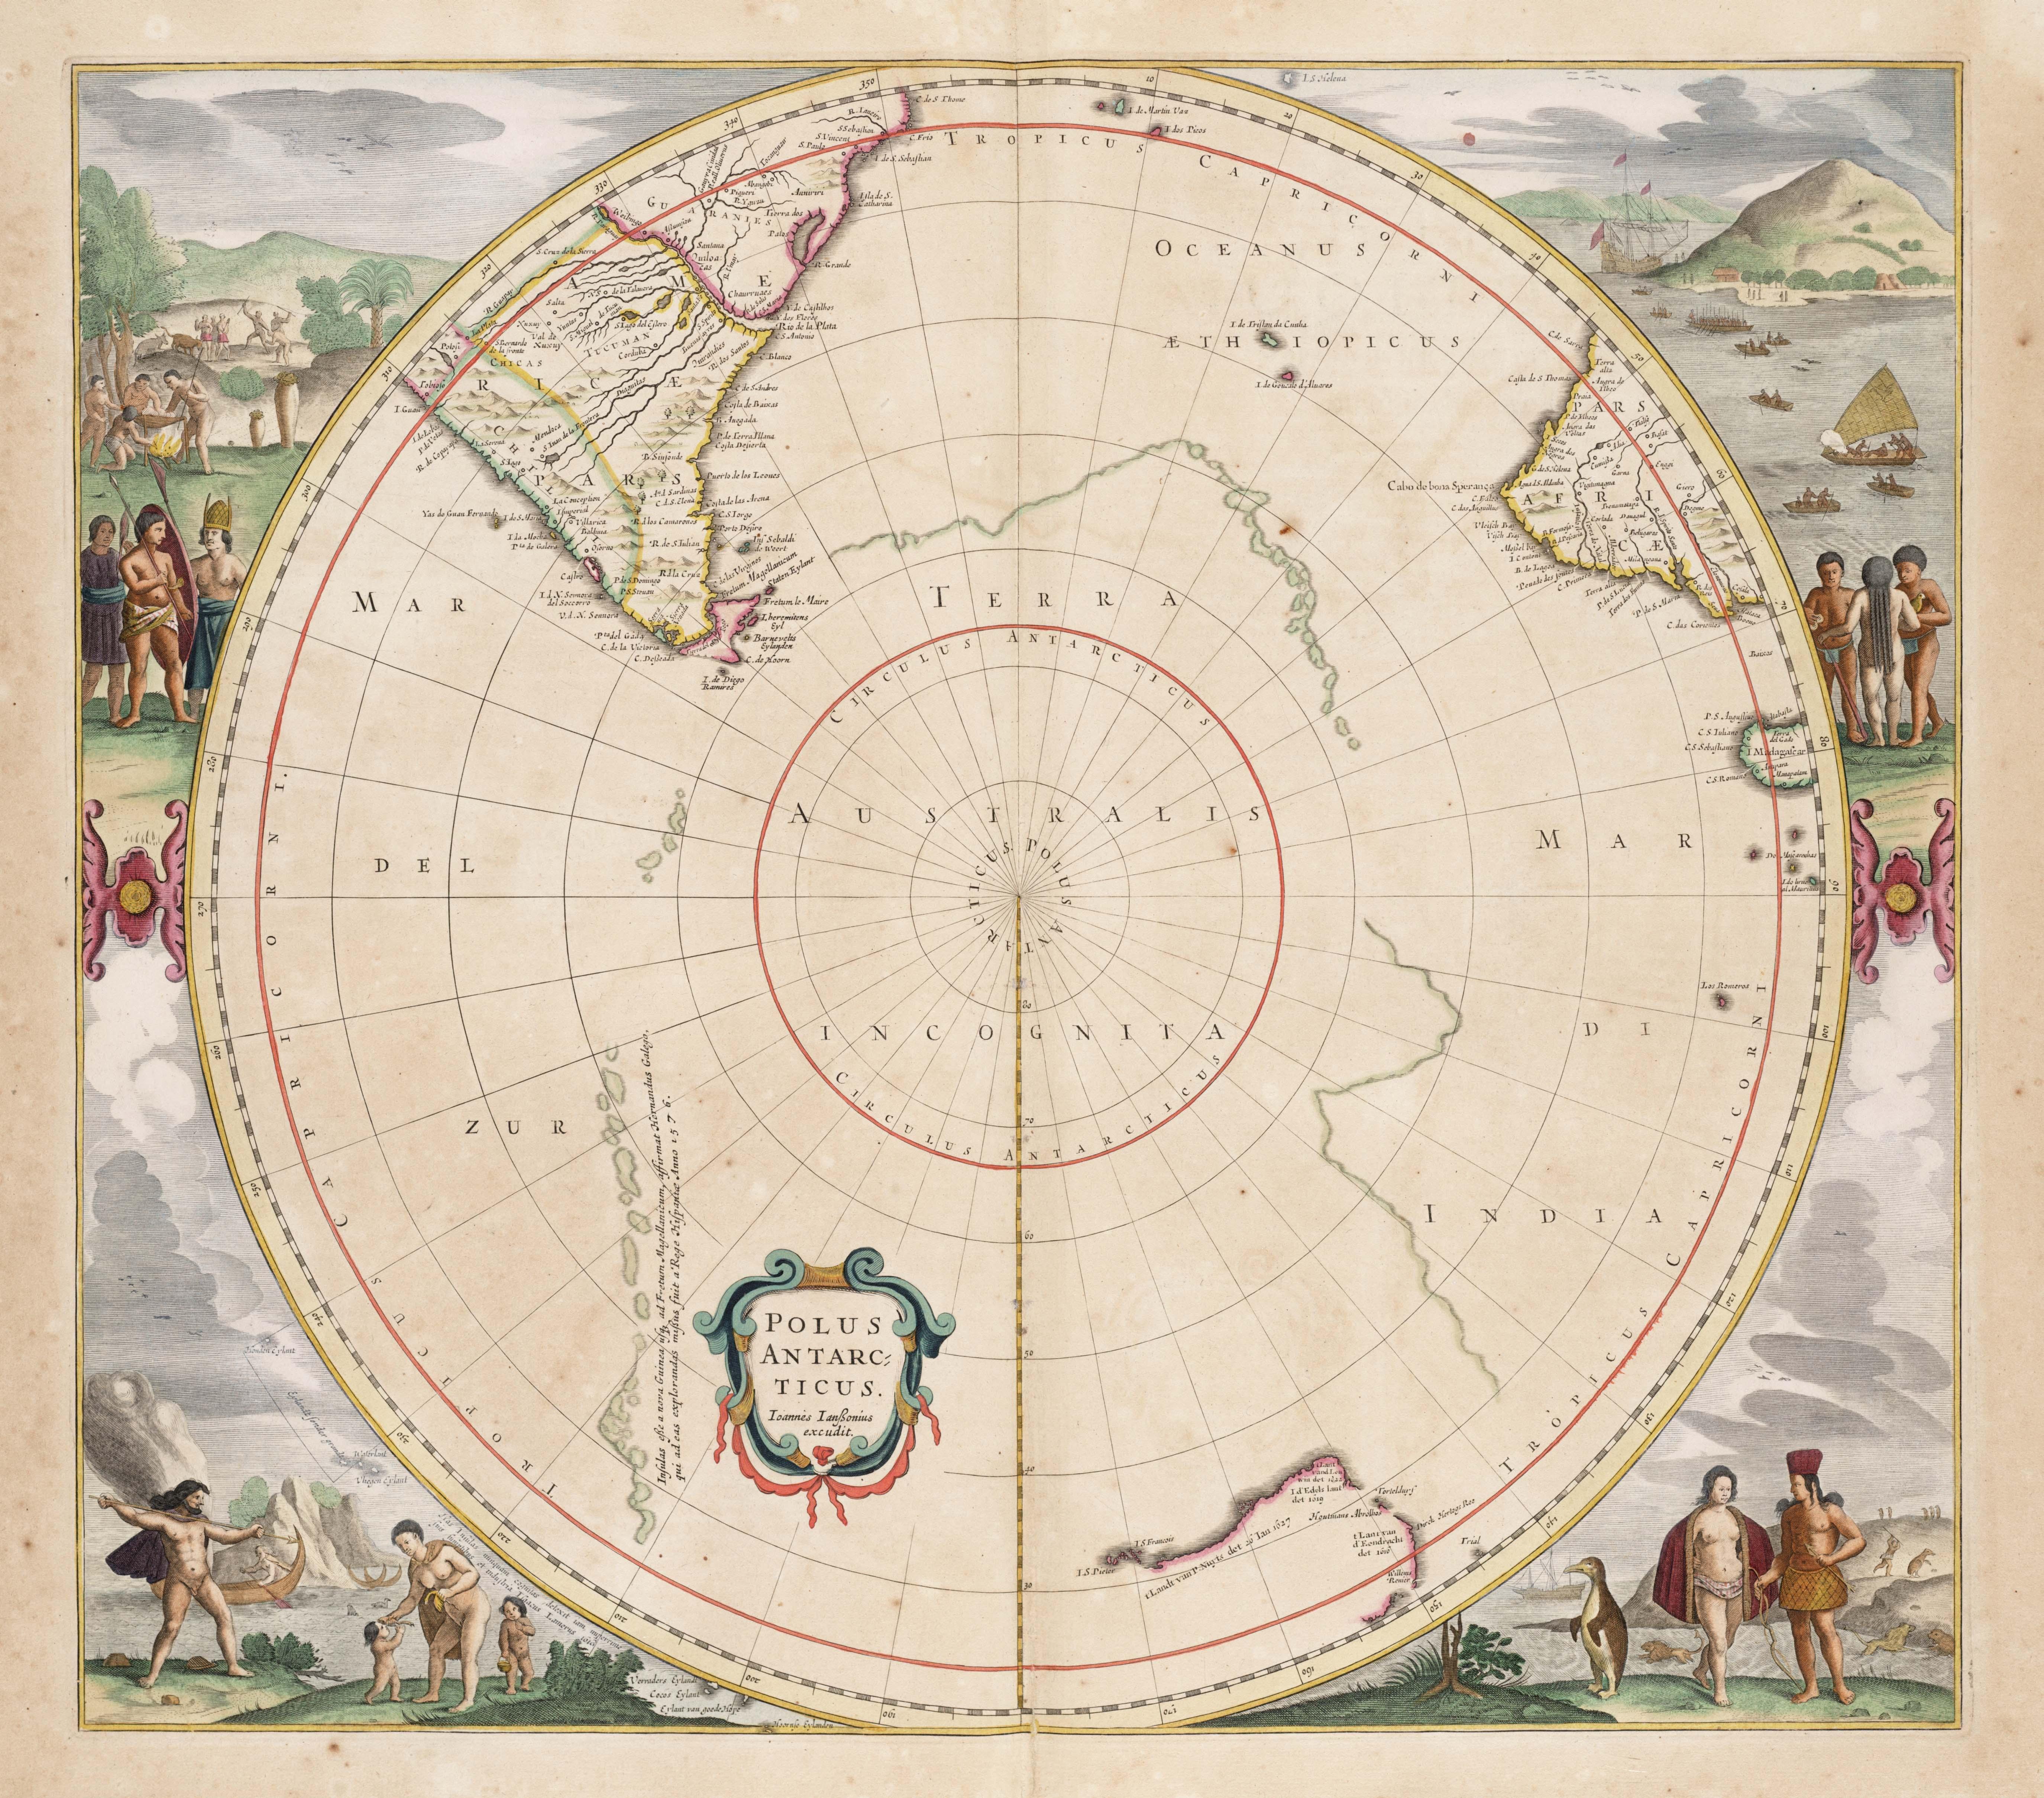 File:1657 map Polus Antarcticus.jpg